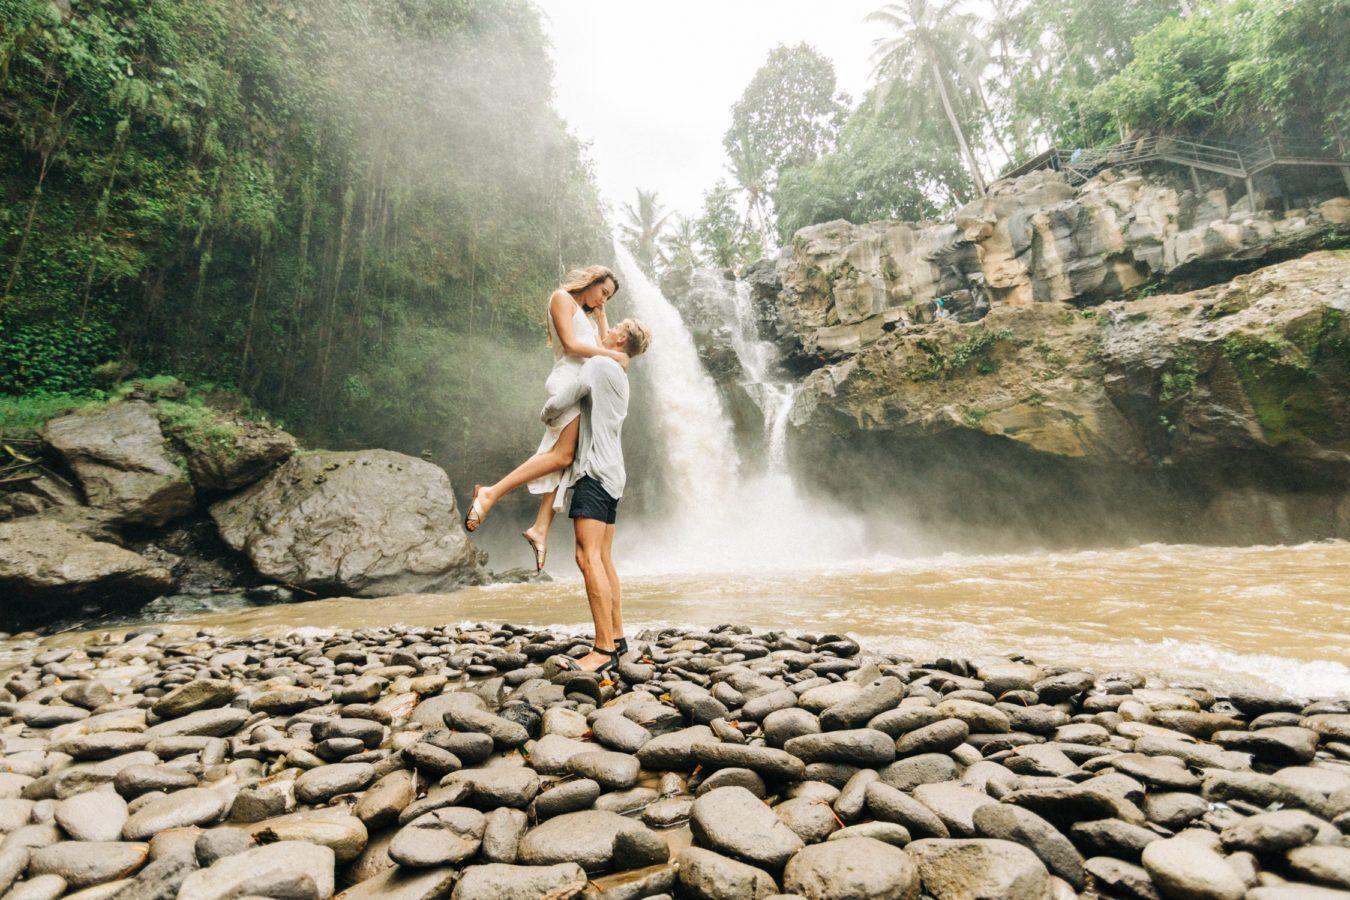 Travel & Adventure Photoshoot in Bali Indonesia - Camilla